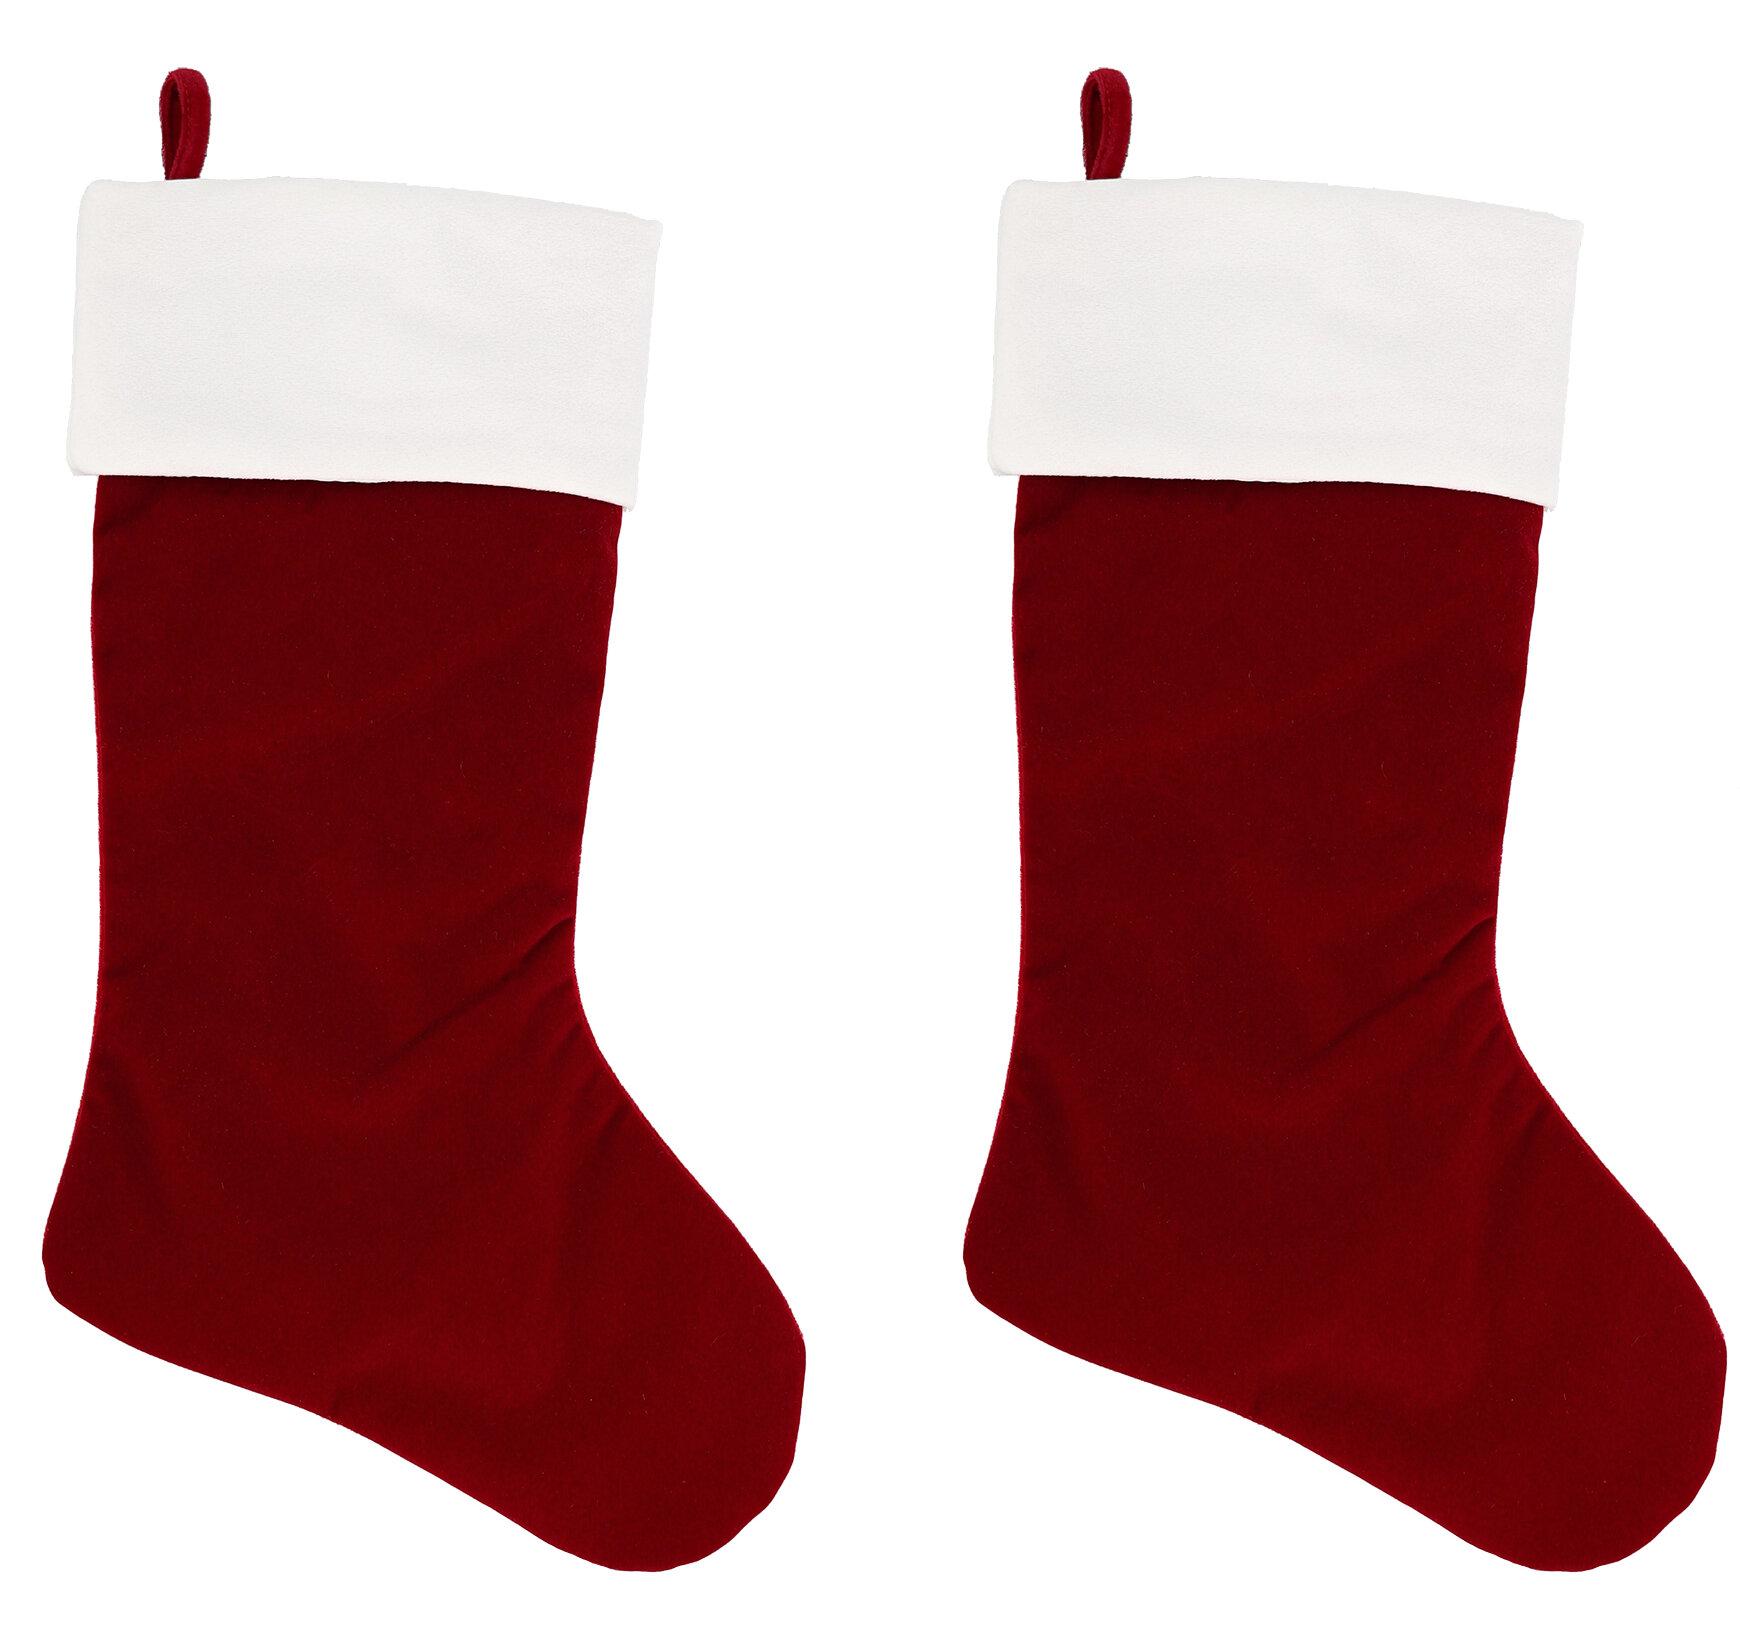 Haute Decor Hangright 2 Deluxe Christmas Stocking Reviews Wayfair